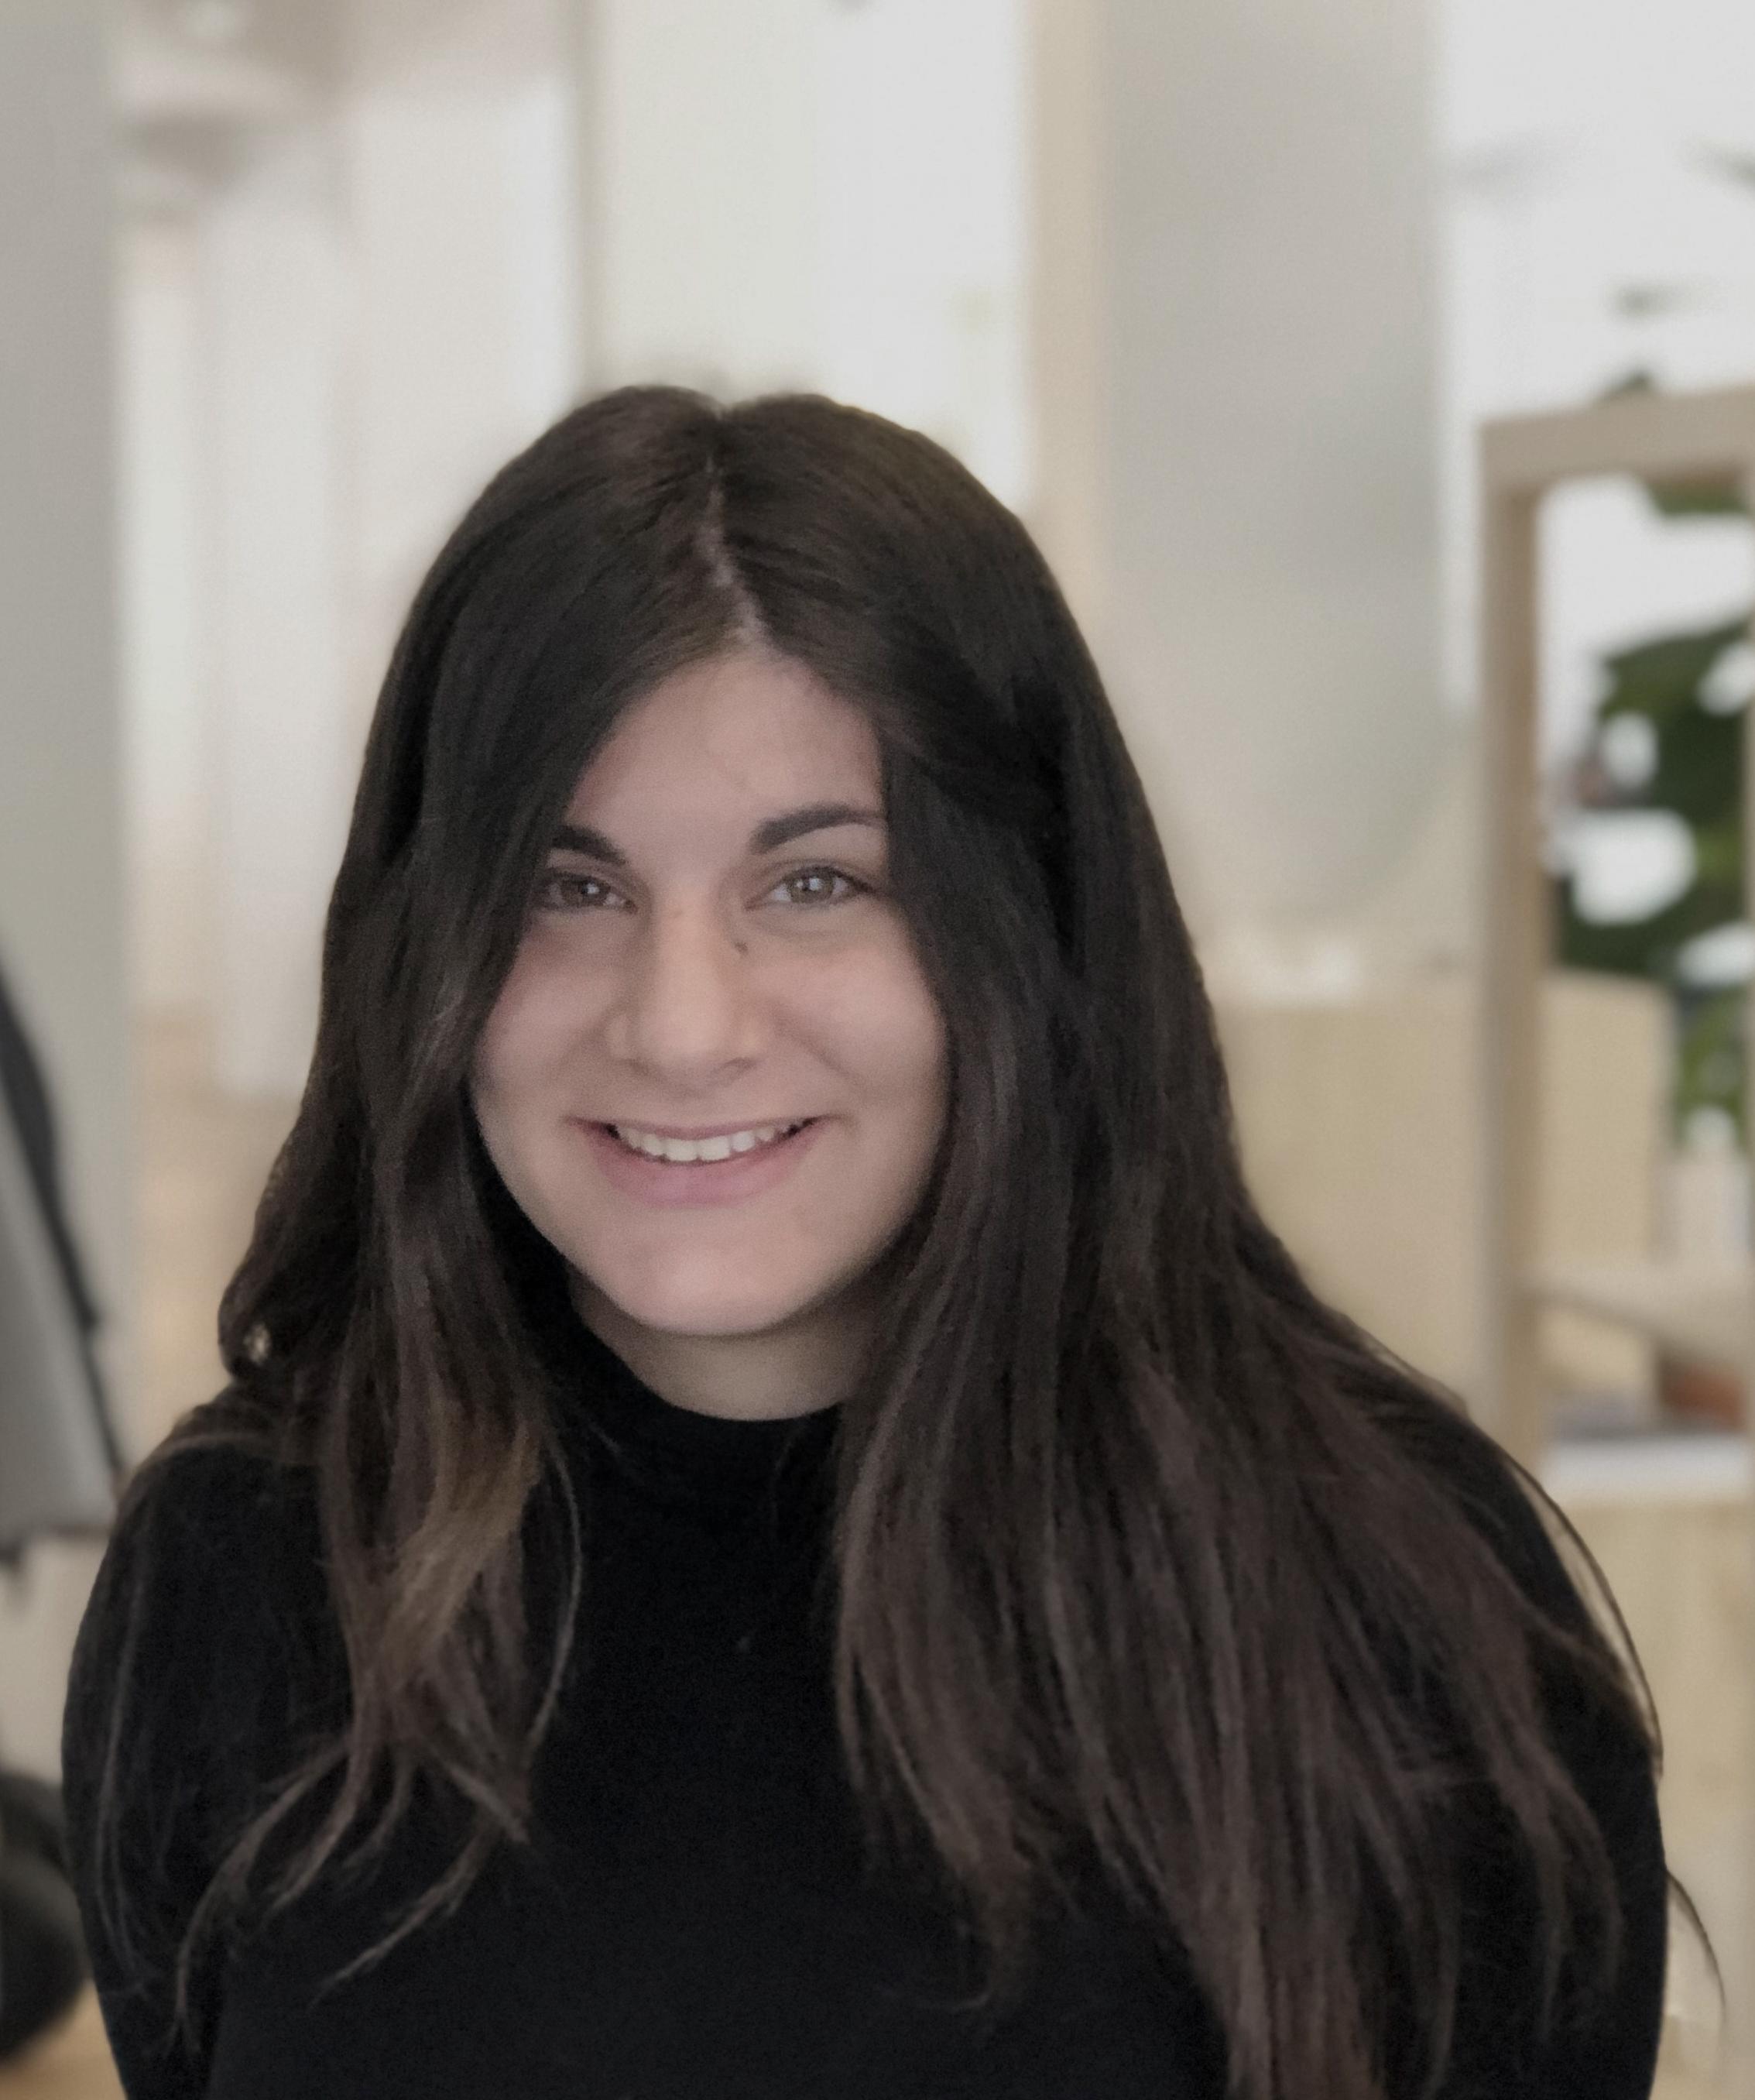 Marina Lamprinoudaki  Intern  ml@we-a.dk